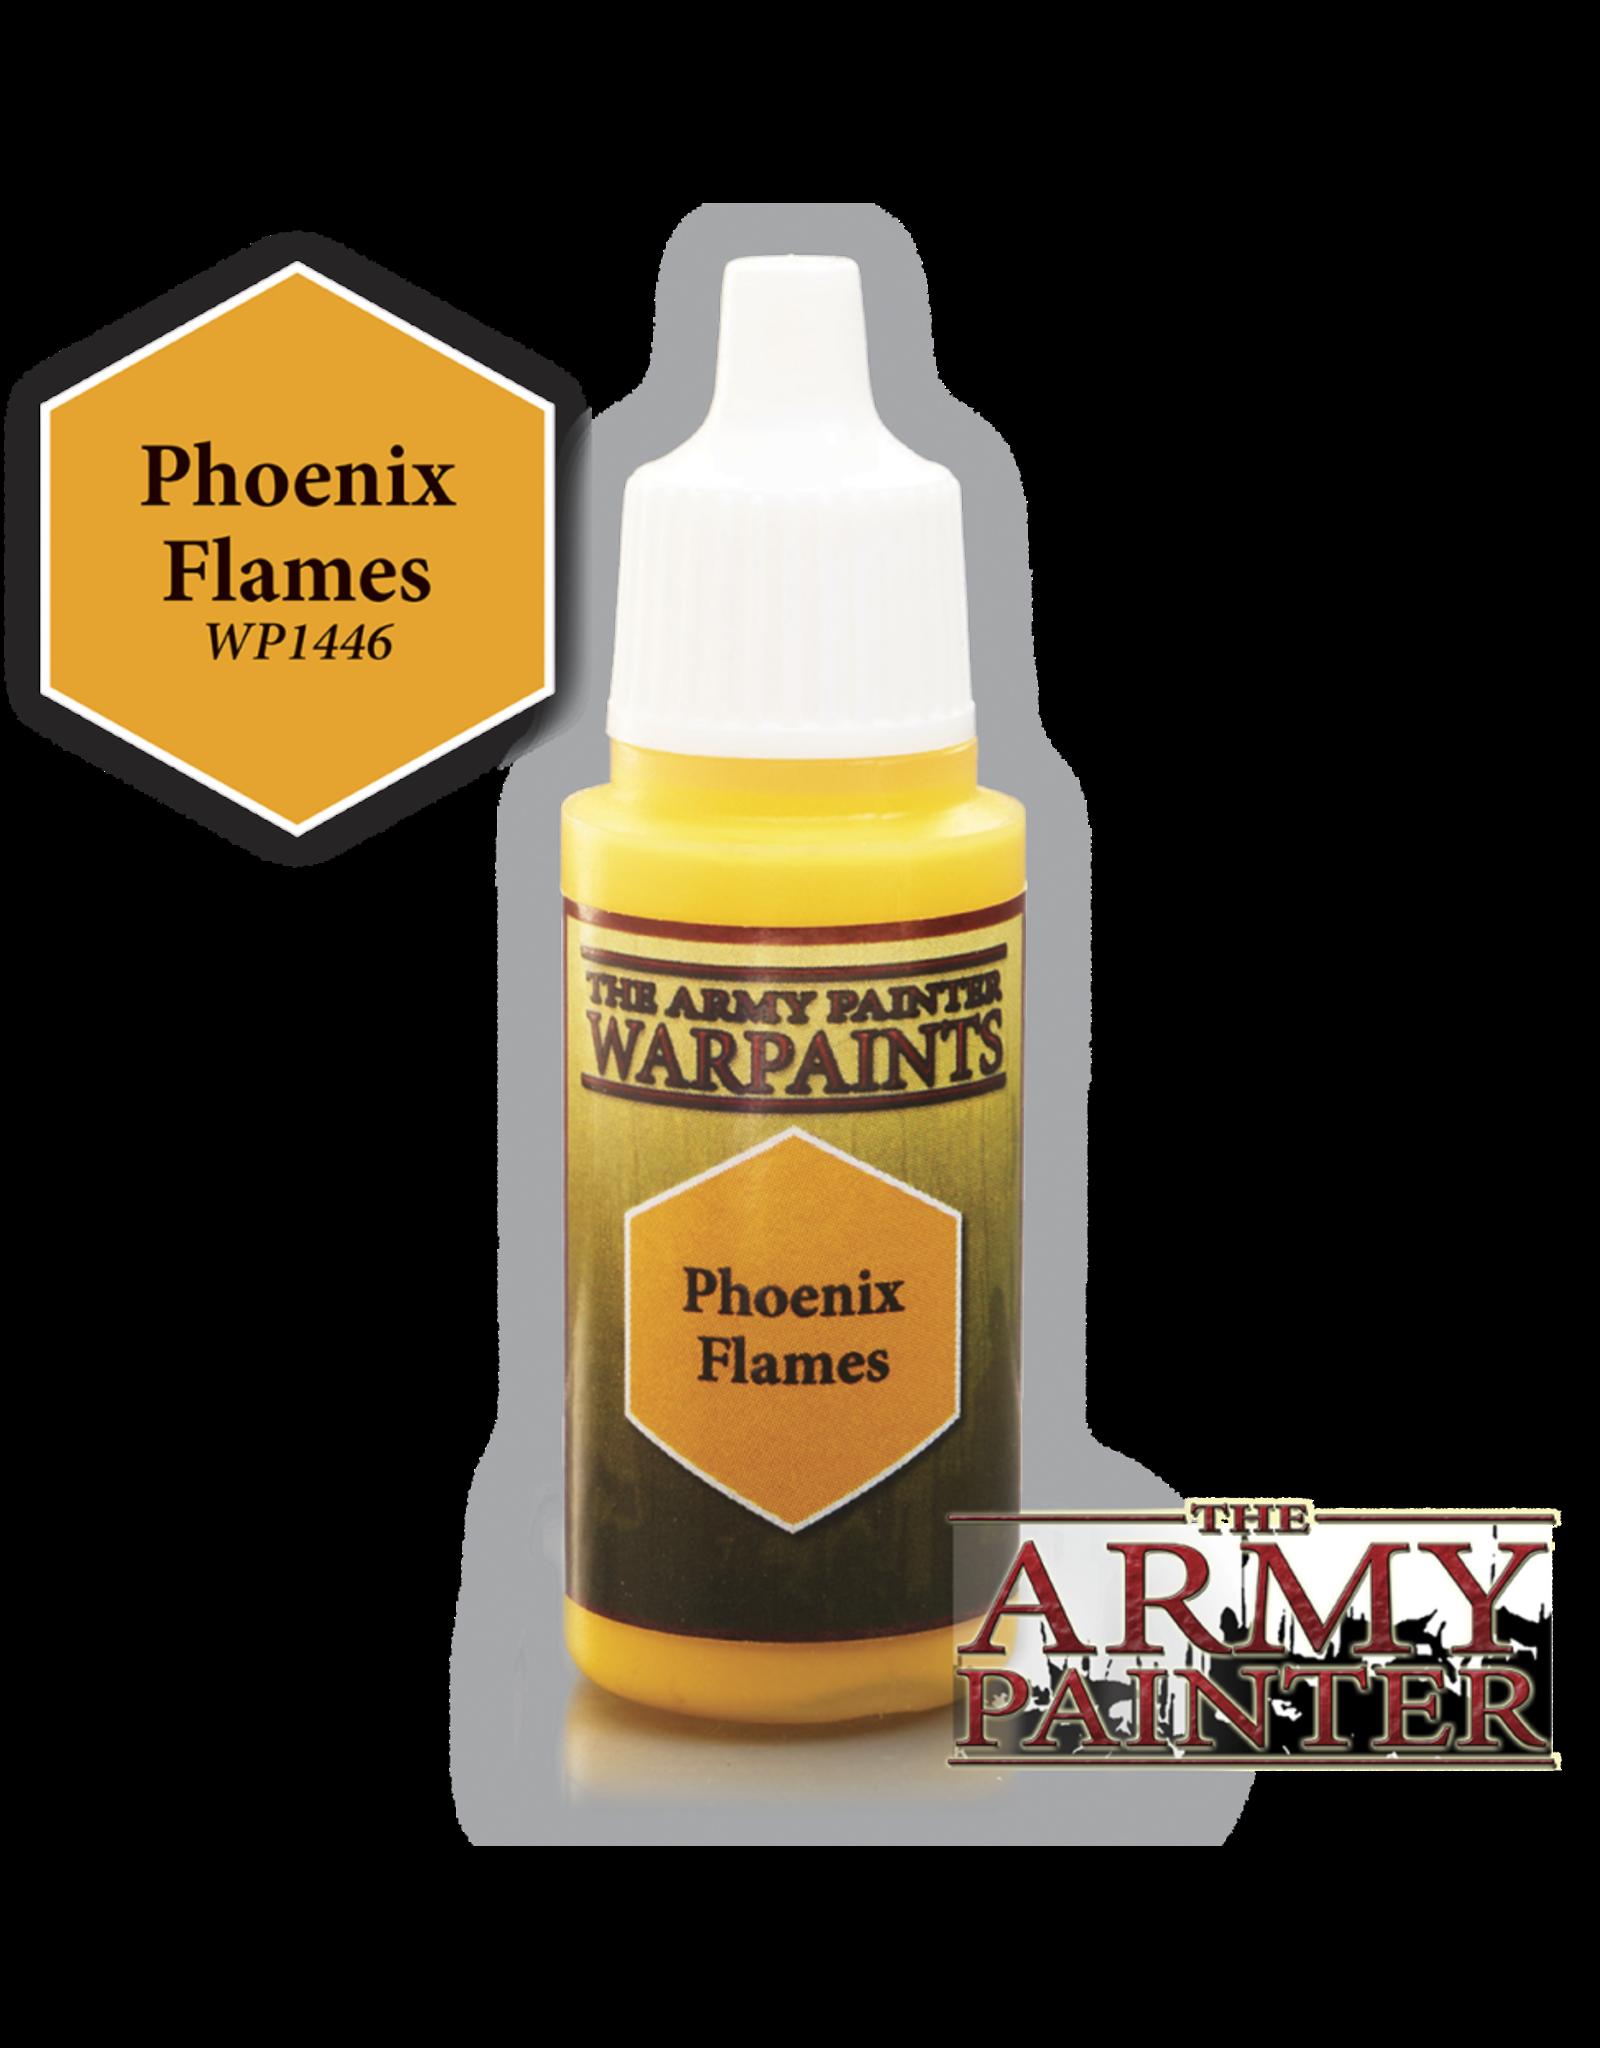 THE ARMY PAINTER ARMY PAINTER WARPAINTS PHOENIX FLAMES